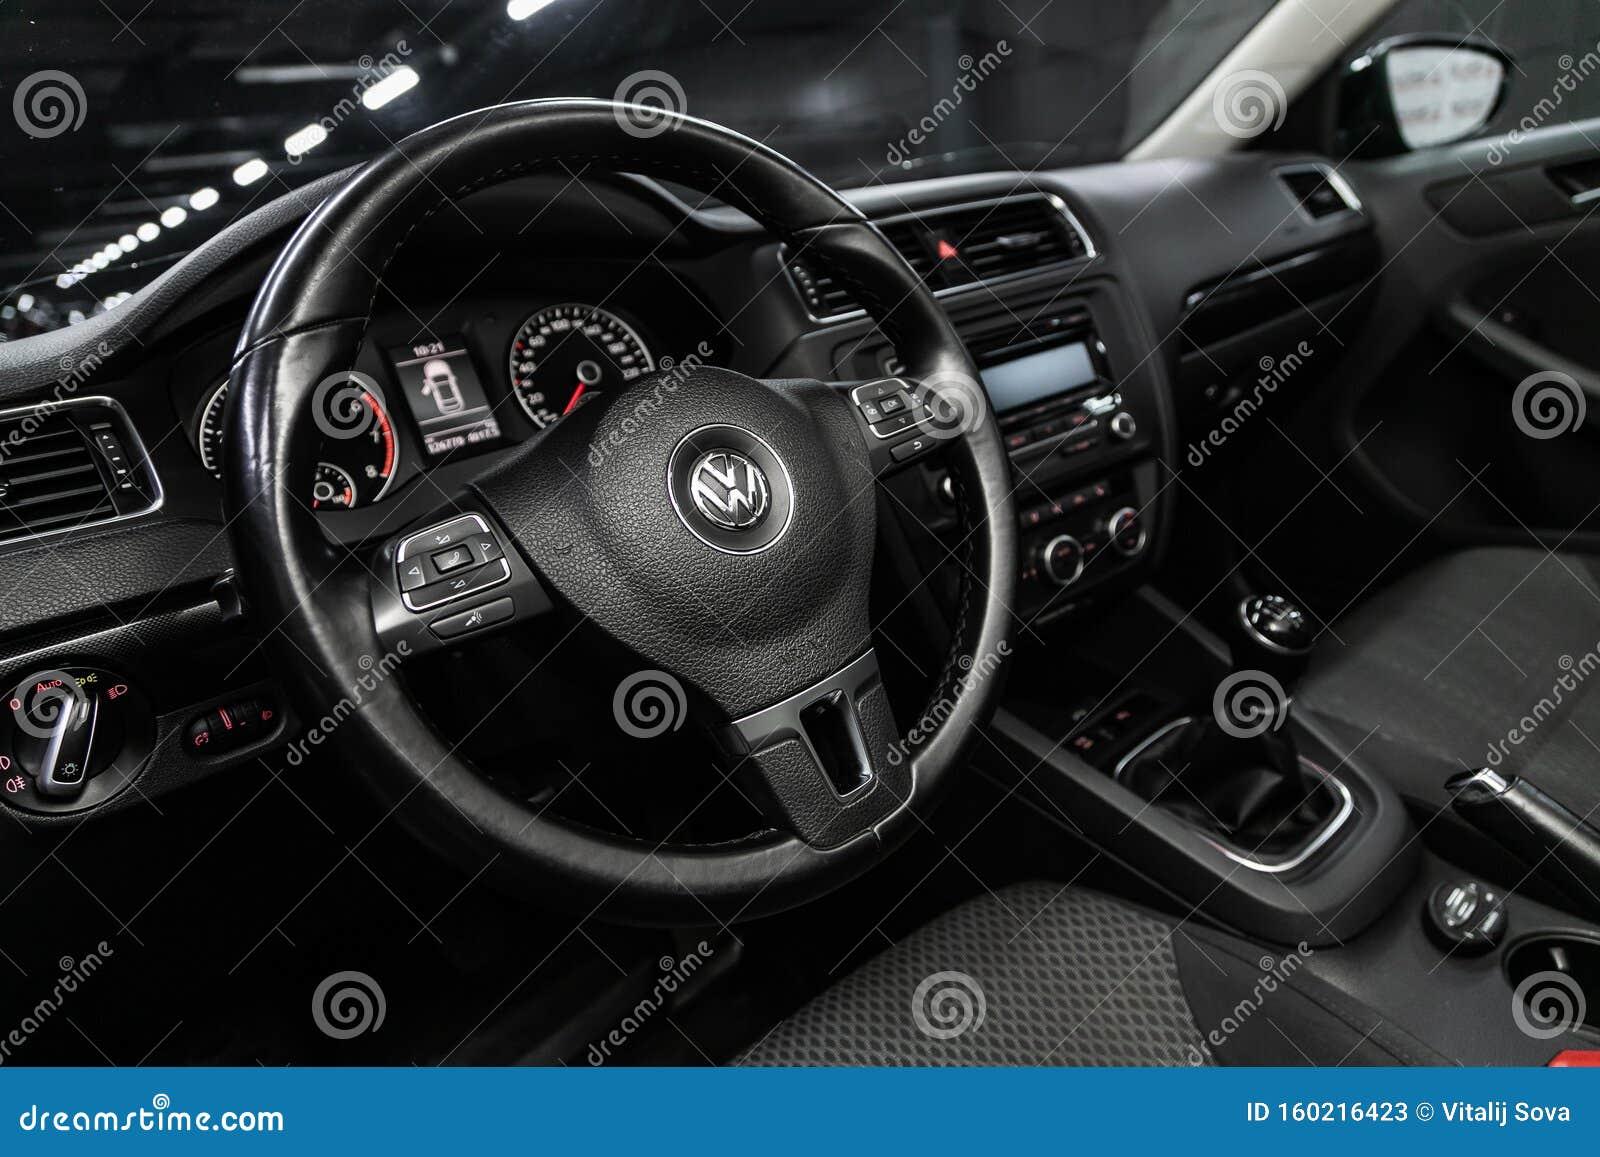 Novosibirsk Russia September 11 2019 Volkswagen Jetta Editorial Stock Photo Image Of Design Colorful 160216423